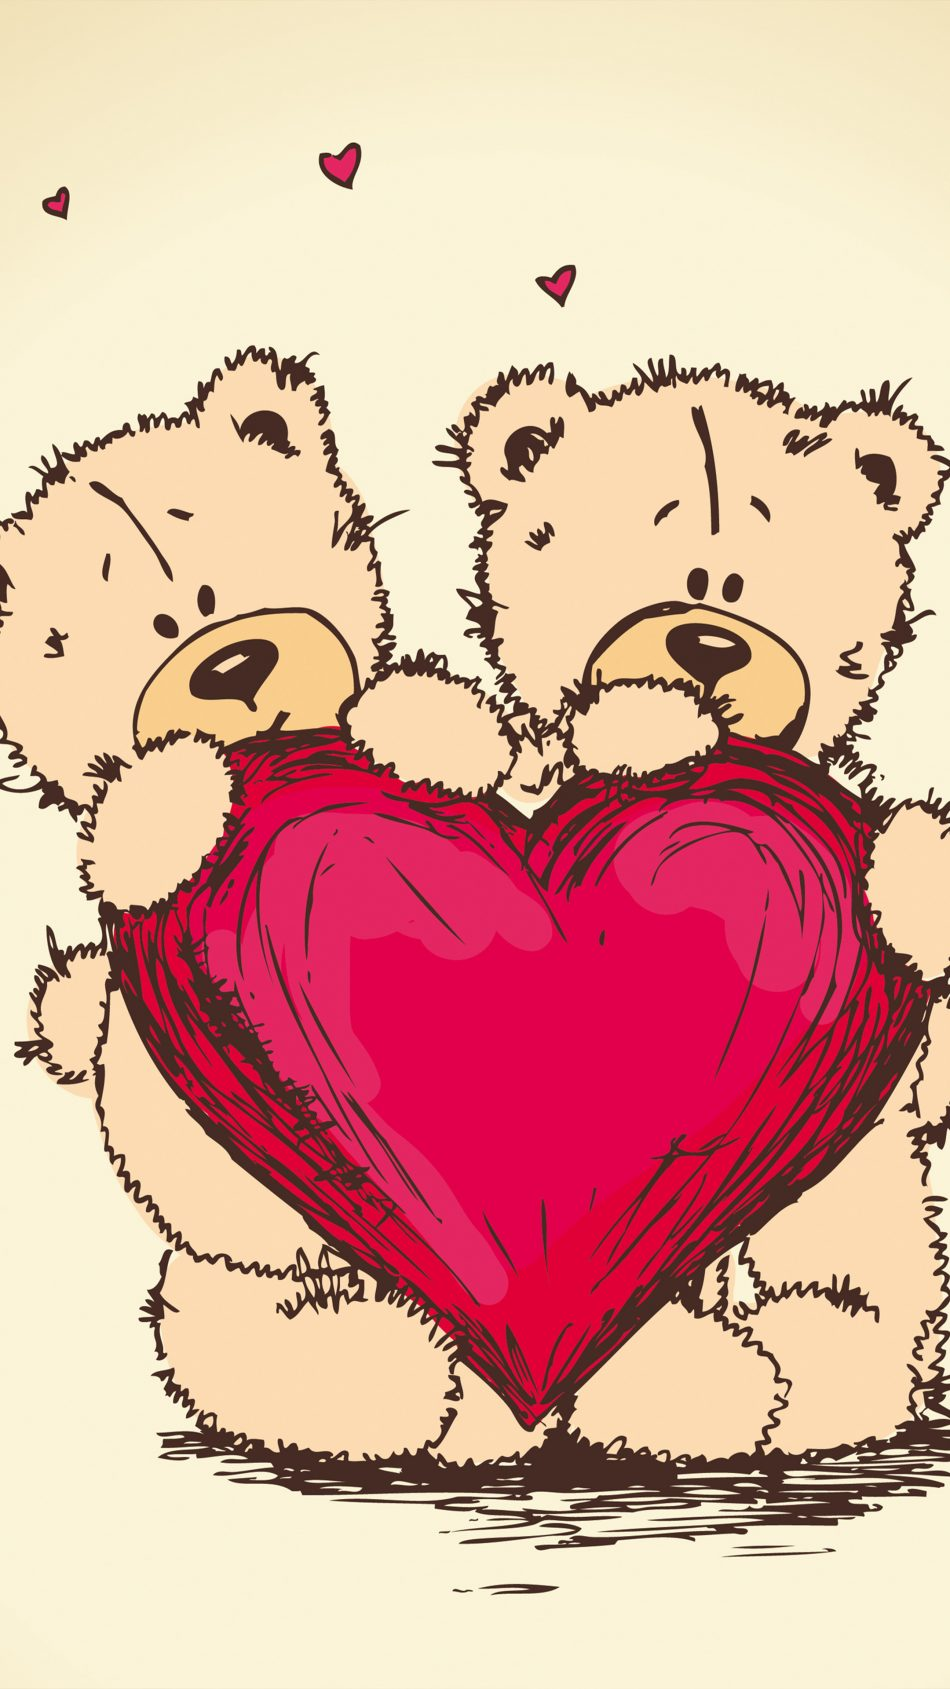 Heart Teddy Bears Valentine's Day Art 4K Ultra HD Mobile Wallpaper